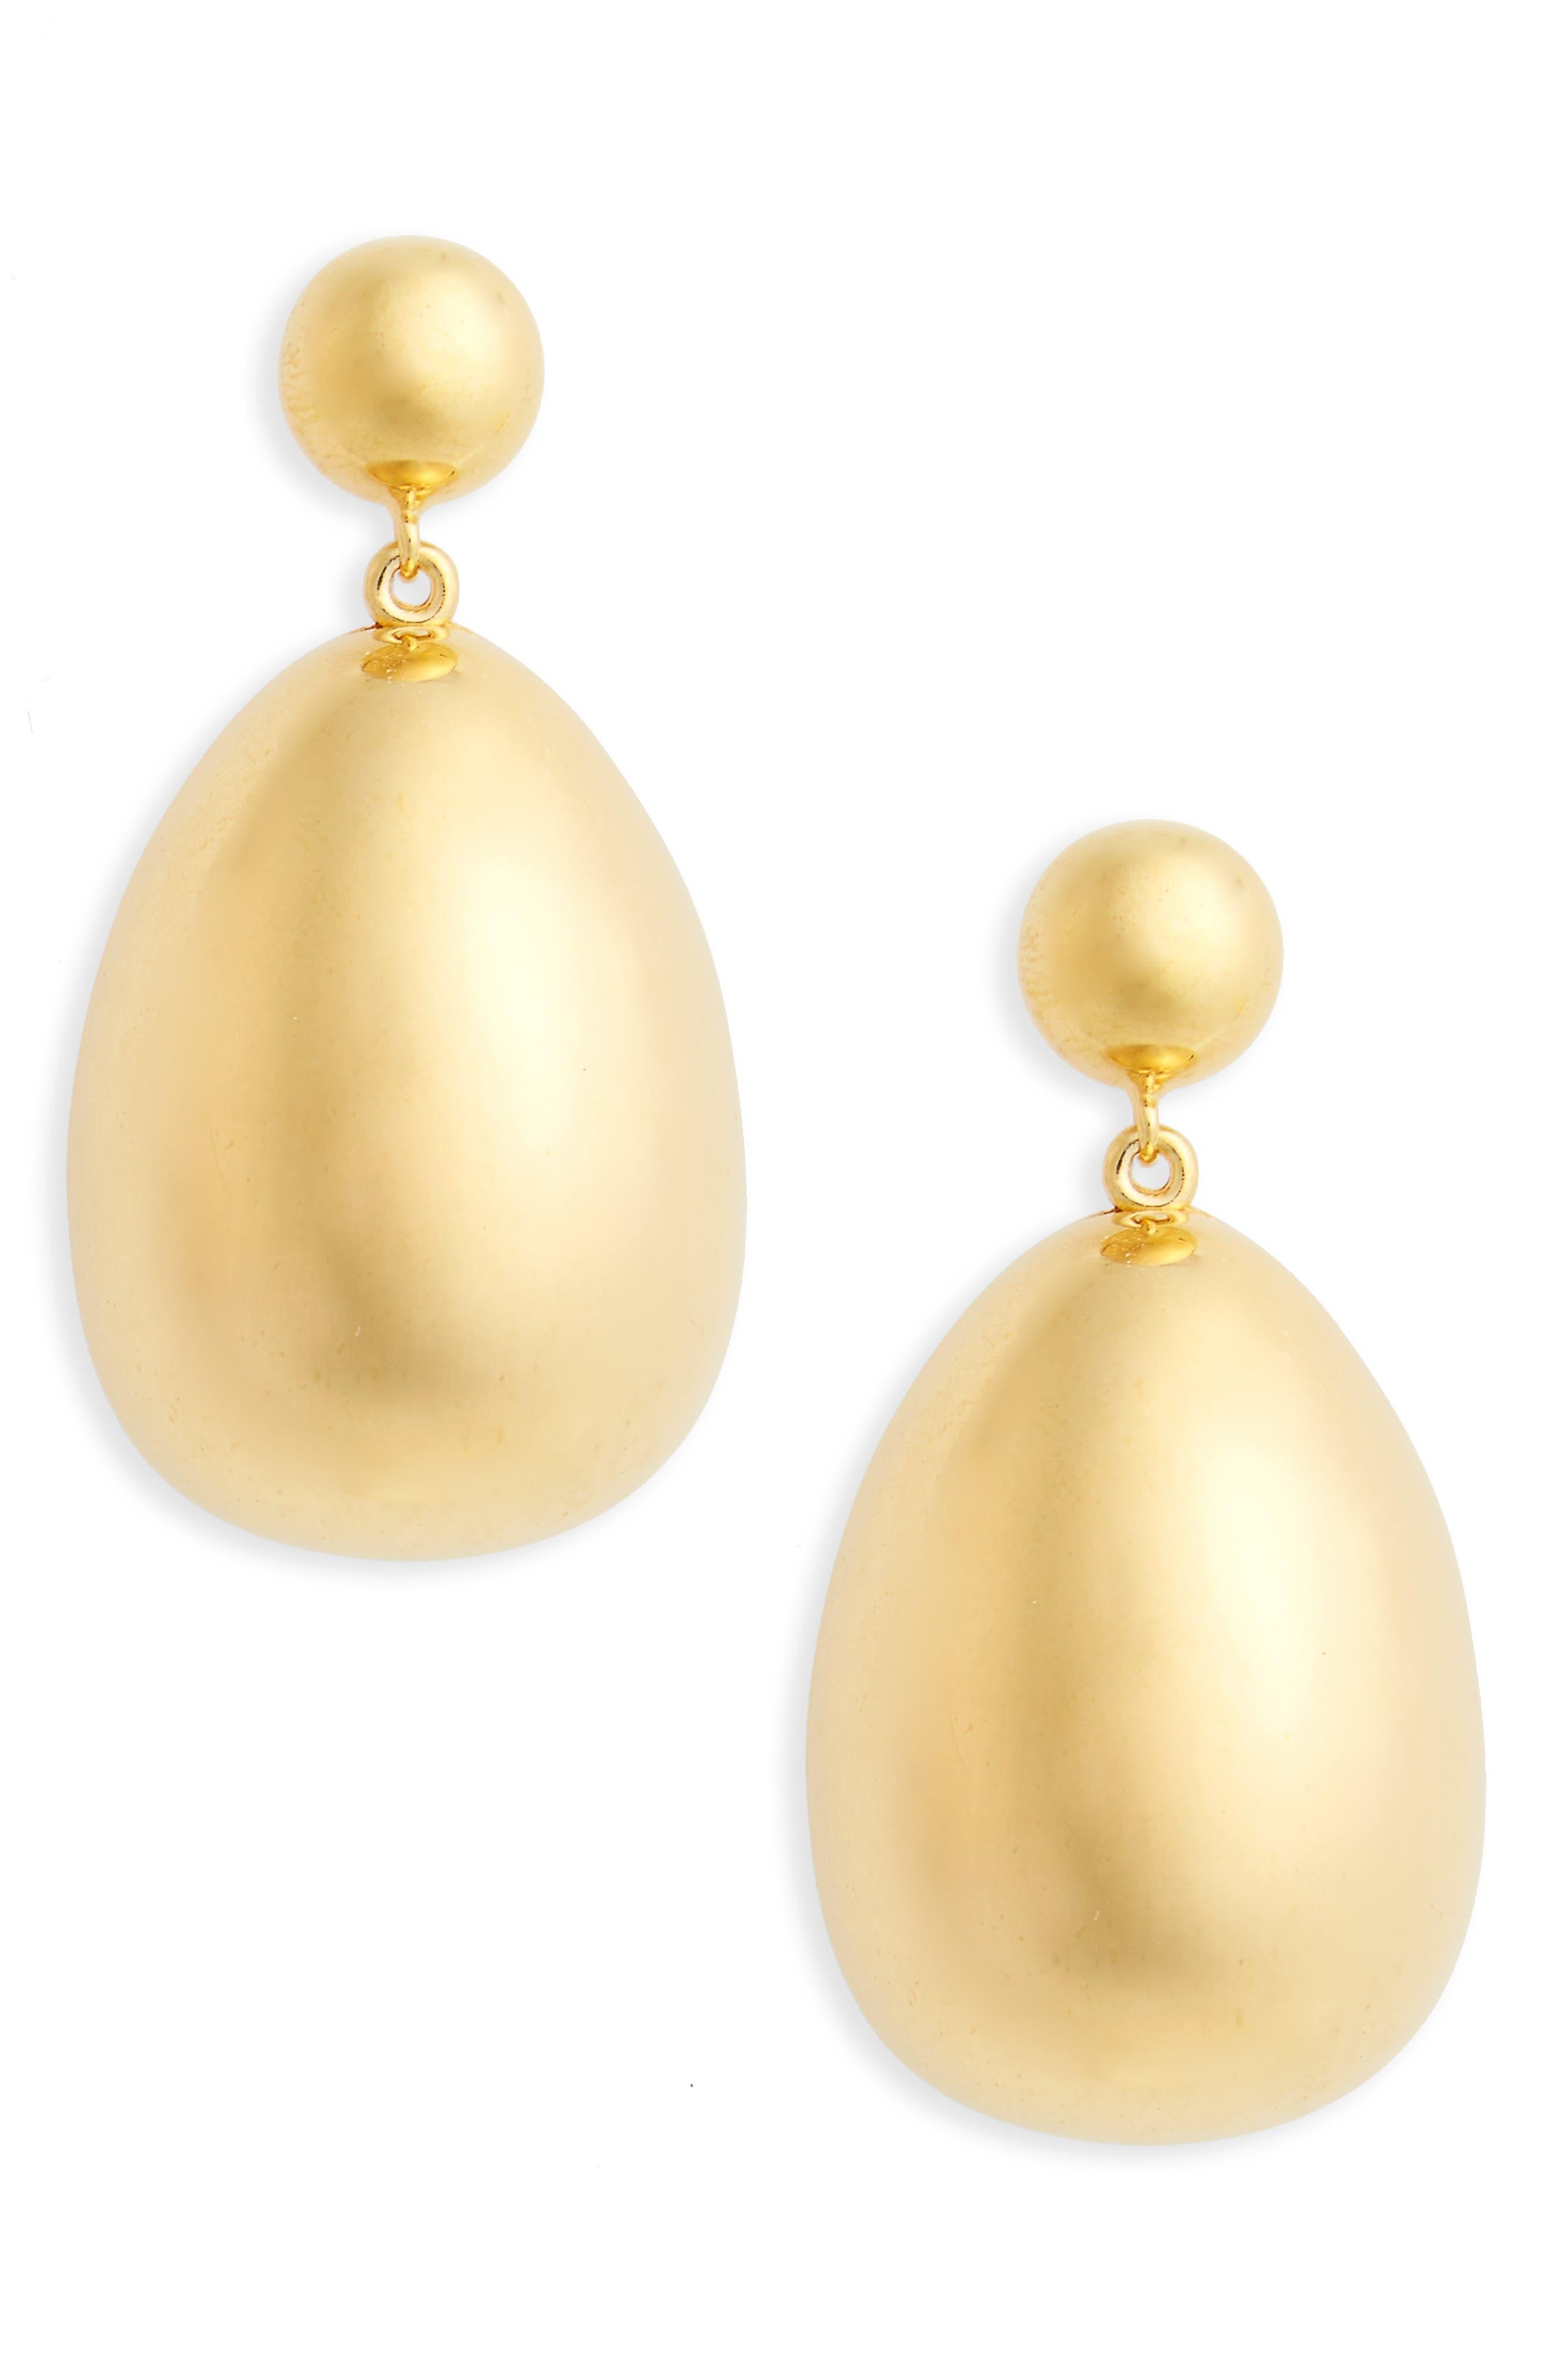 Vermeil Egg Drop Earrings,                             Main thumbnail 1, color,                             Vermeill